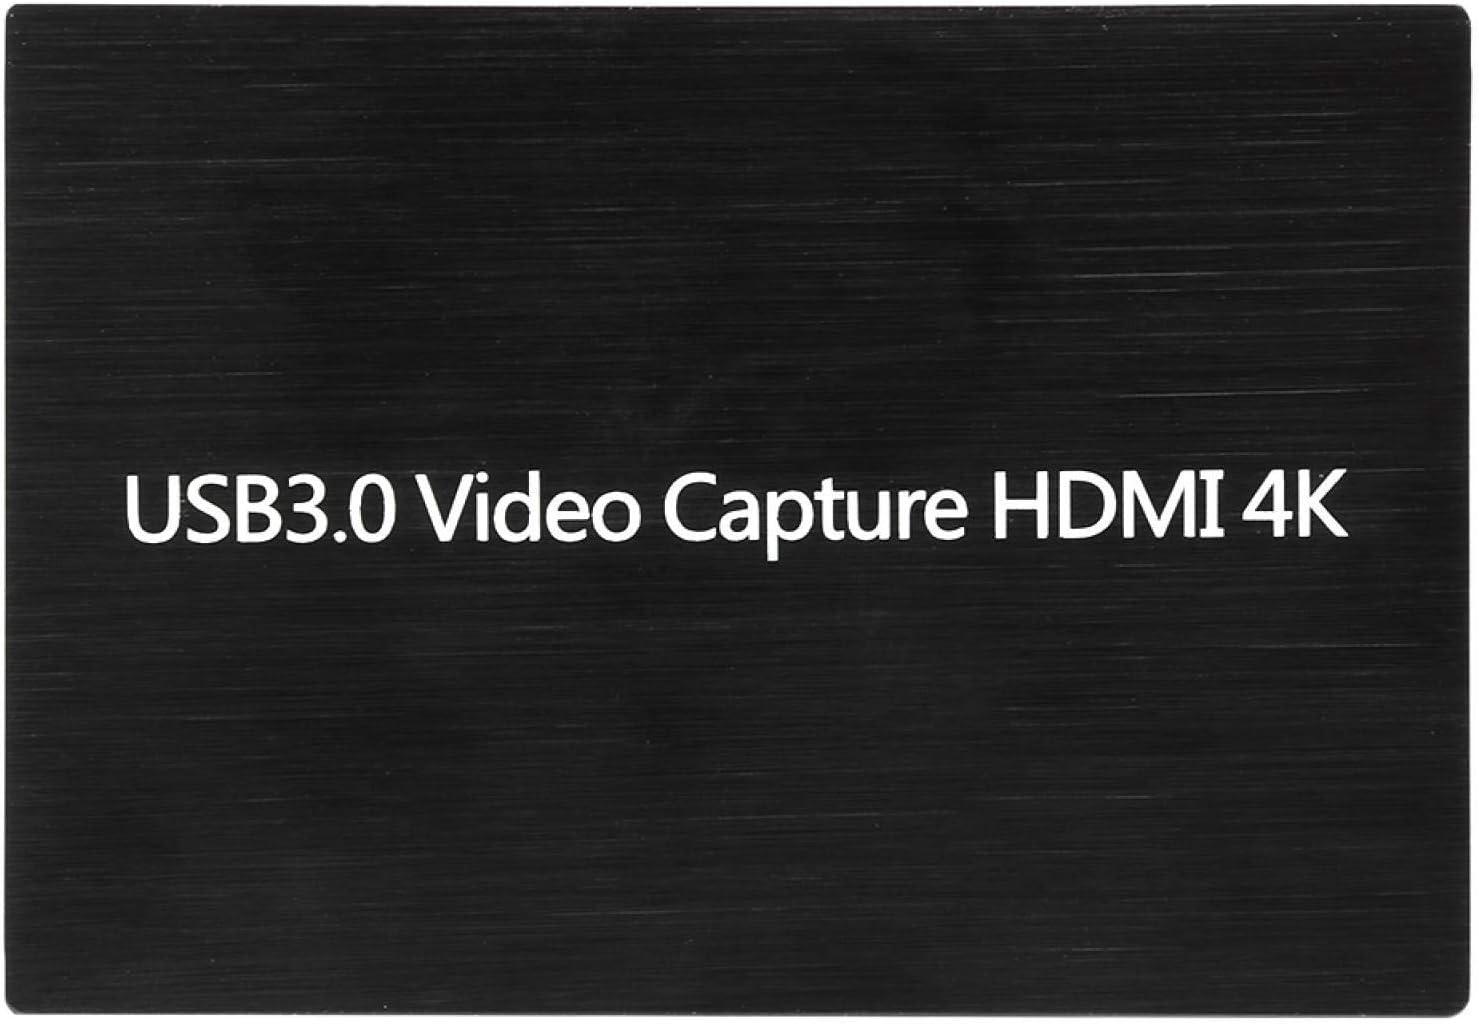 Socobeta S300 HDMI Los Angeles Mall Capture Game Card Driver‑Free Max 78% OFF